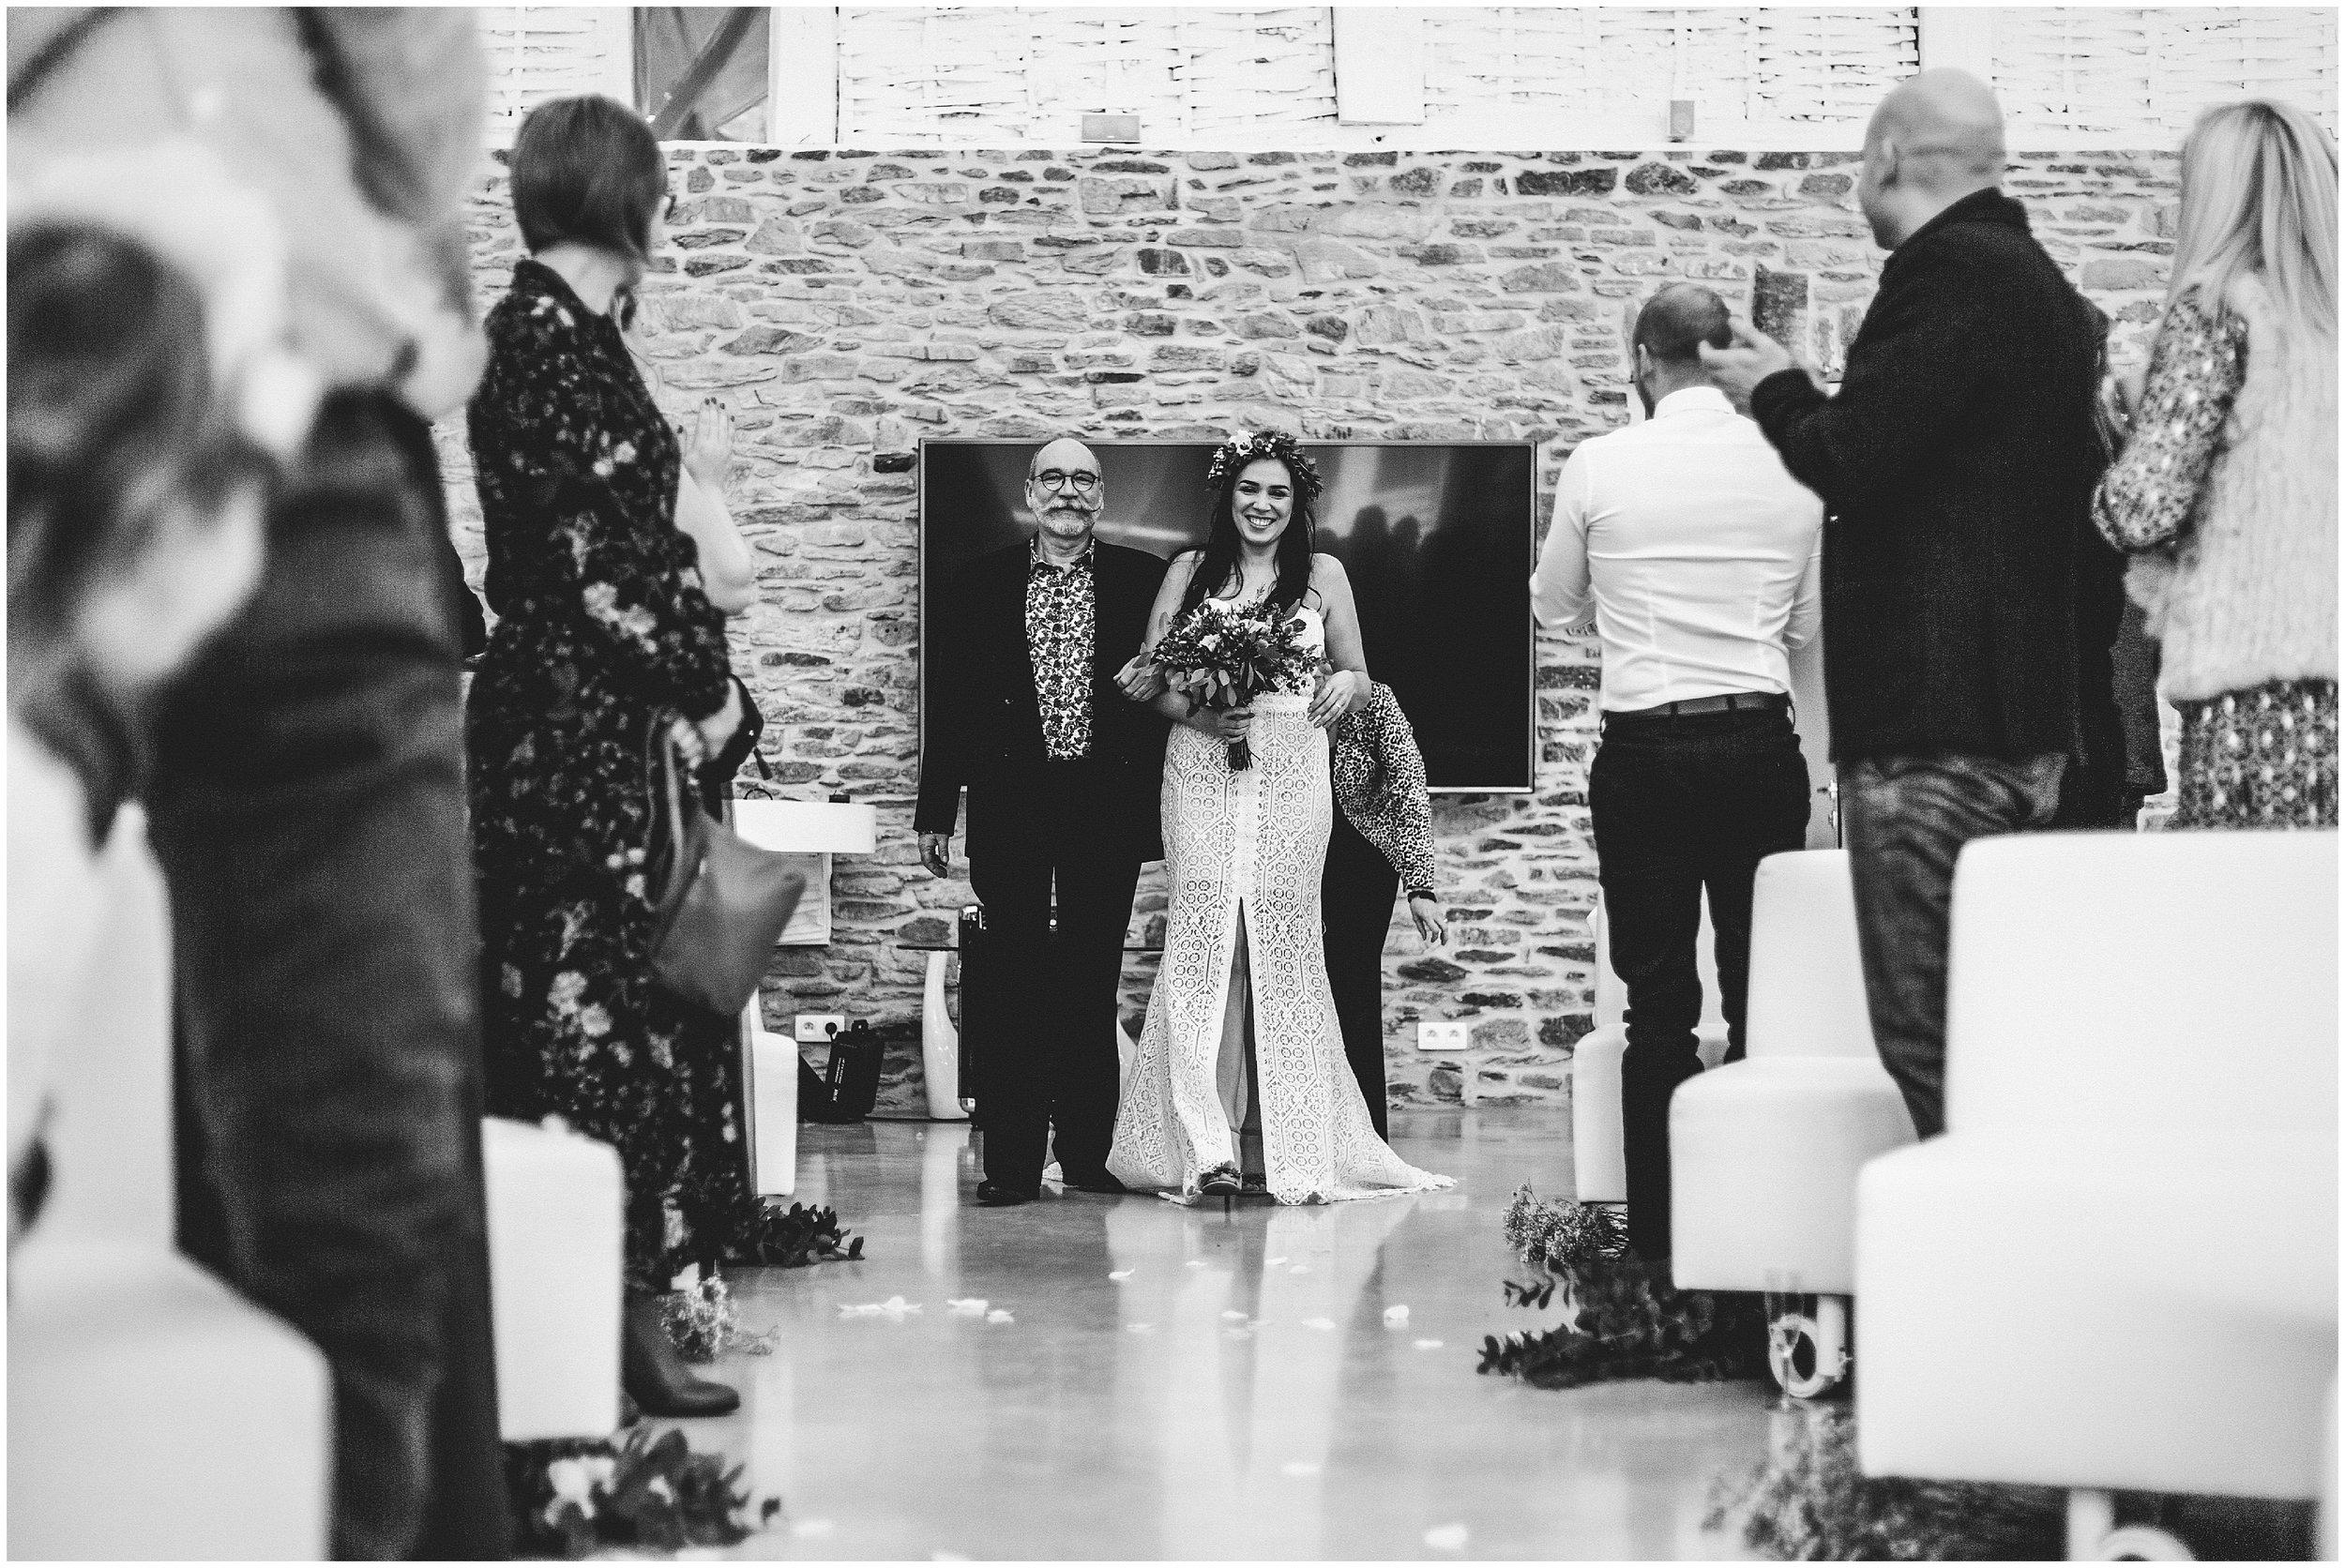 huwelijksfotografie-jana-joeri-ardennen-sechery_0010.jpg